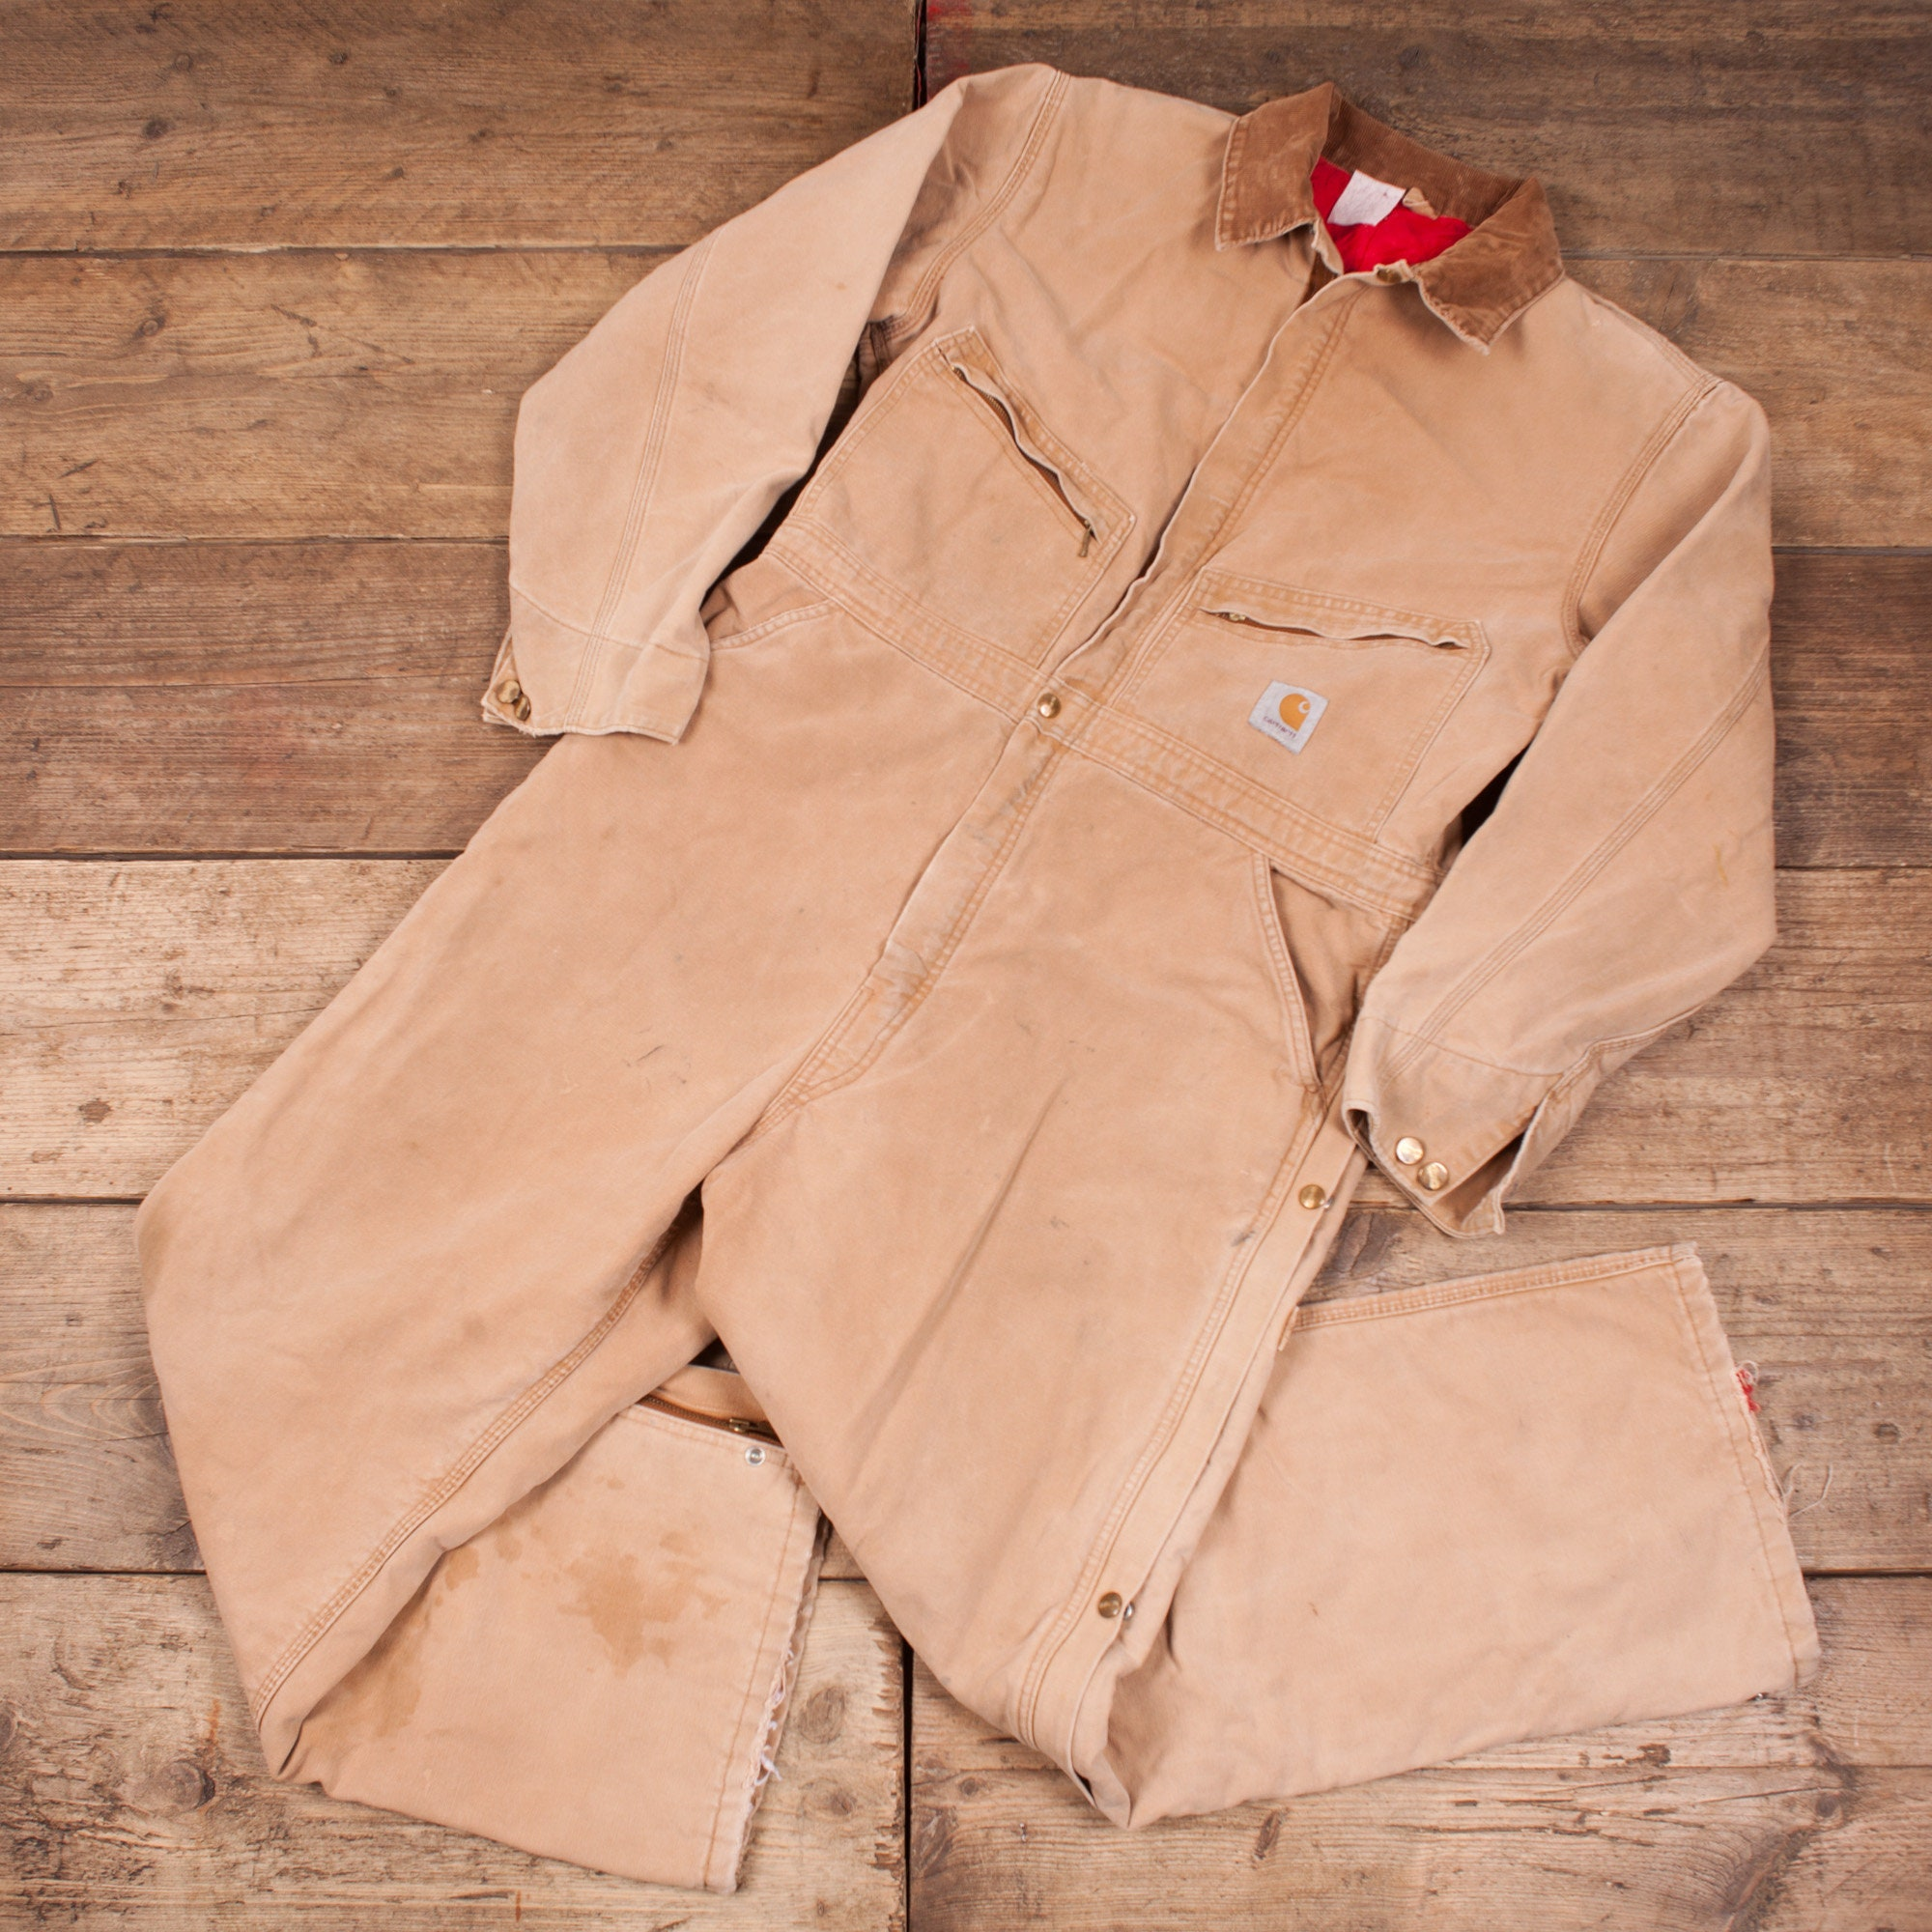 065dabbbb80 Mens Vintage Carhartt Duck Brown Workwear Coverall Boiler Suit